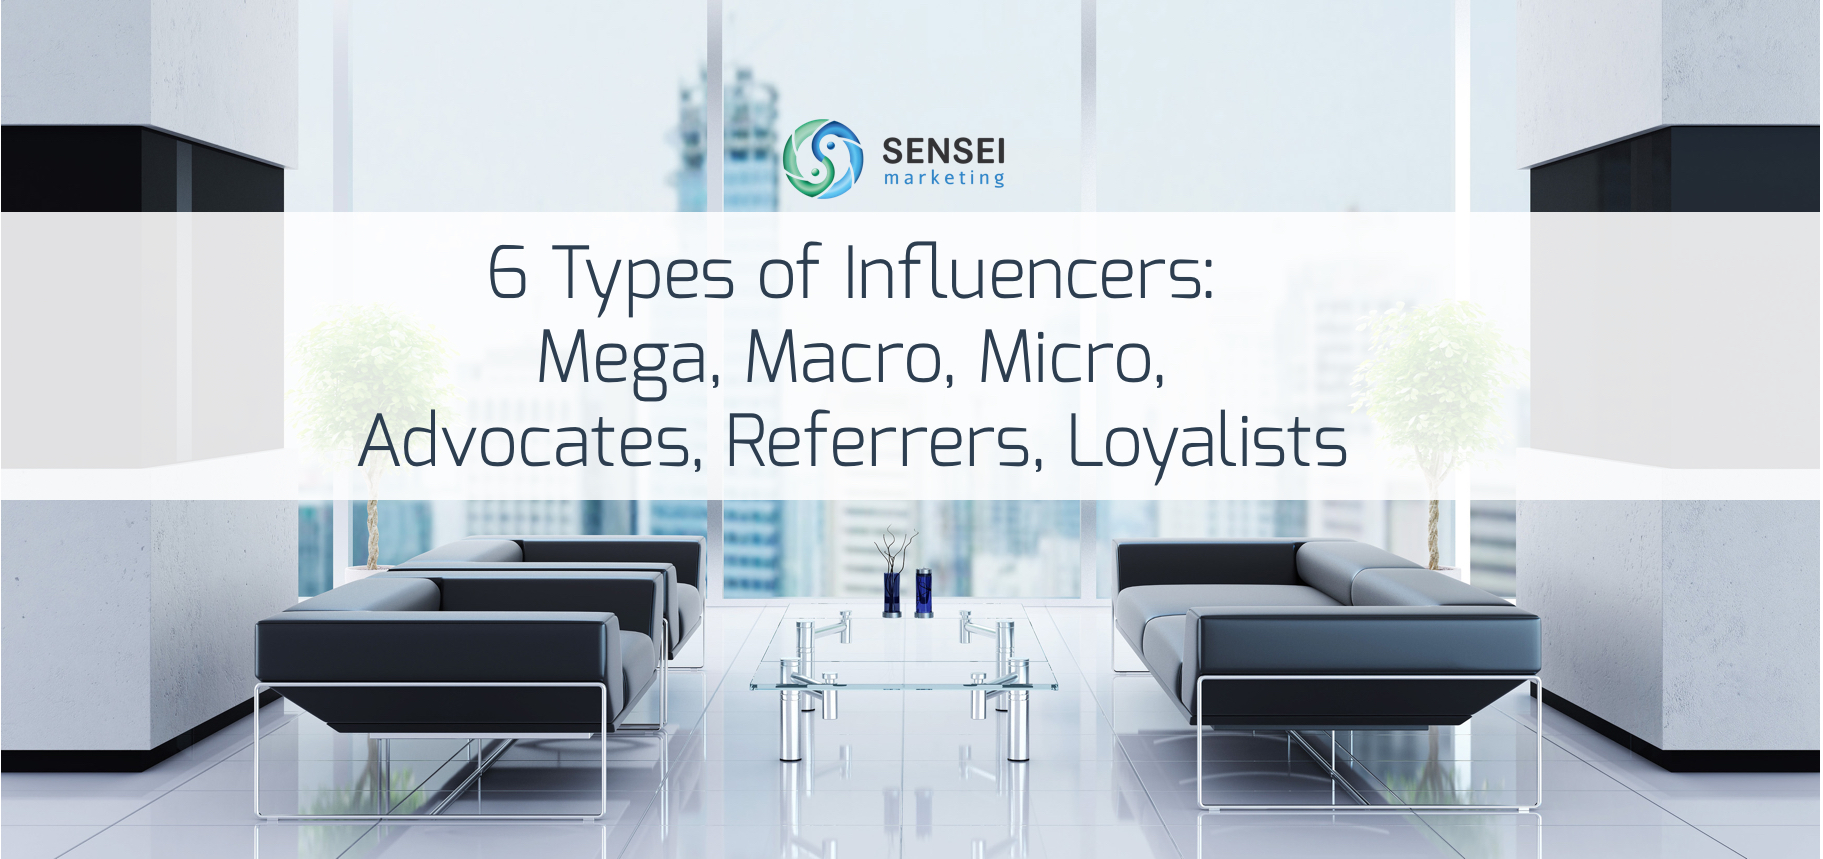 types-of-influencers | Sensei Marketing